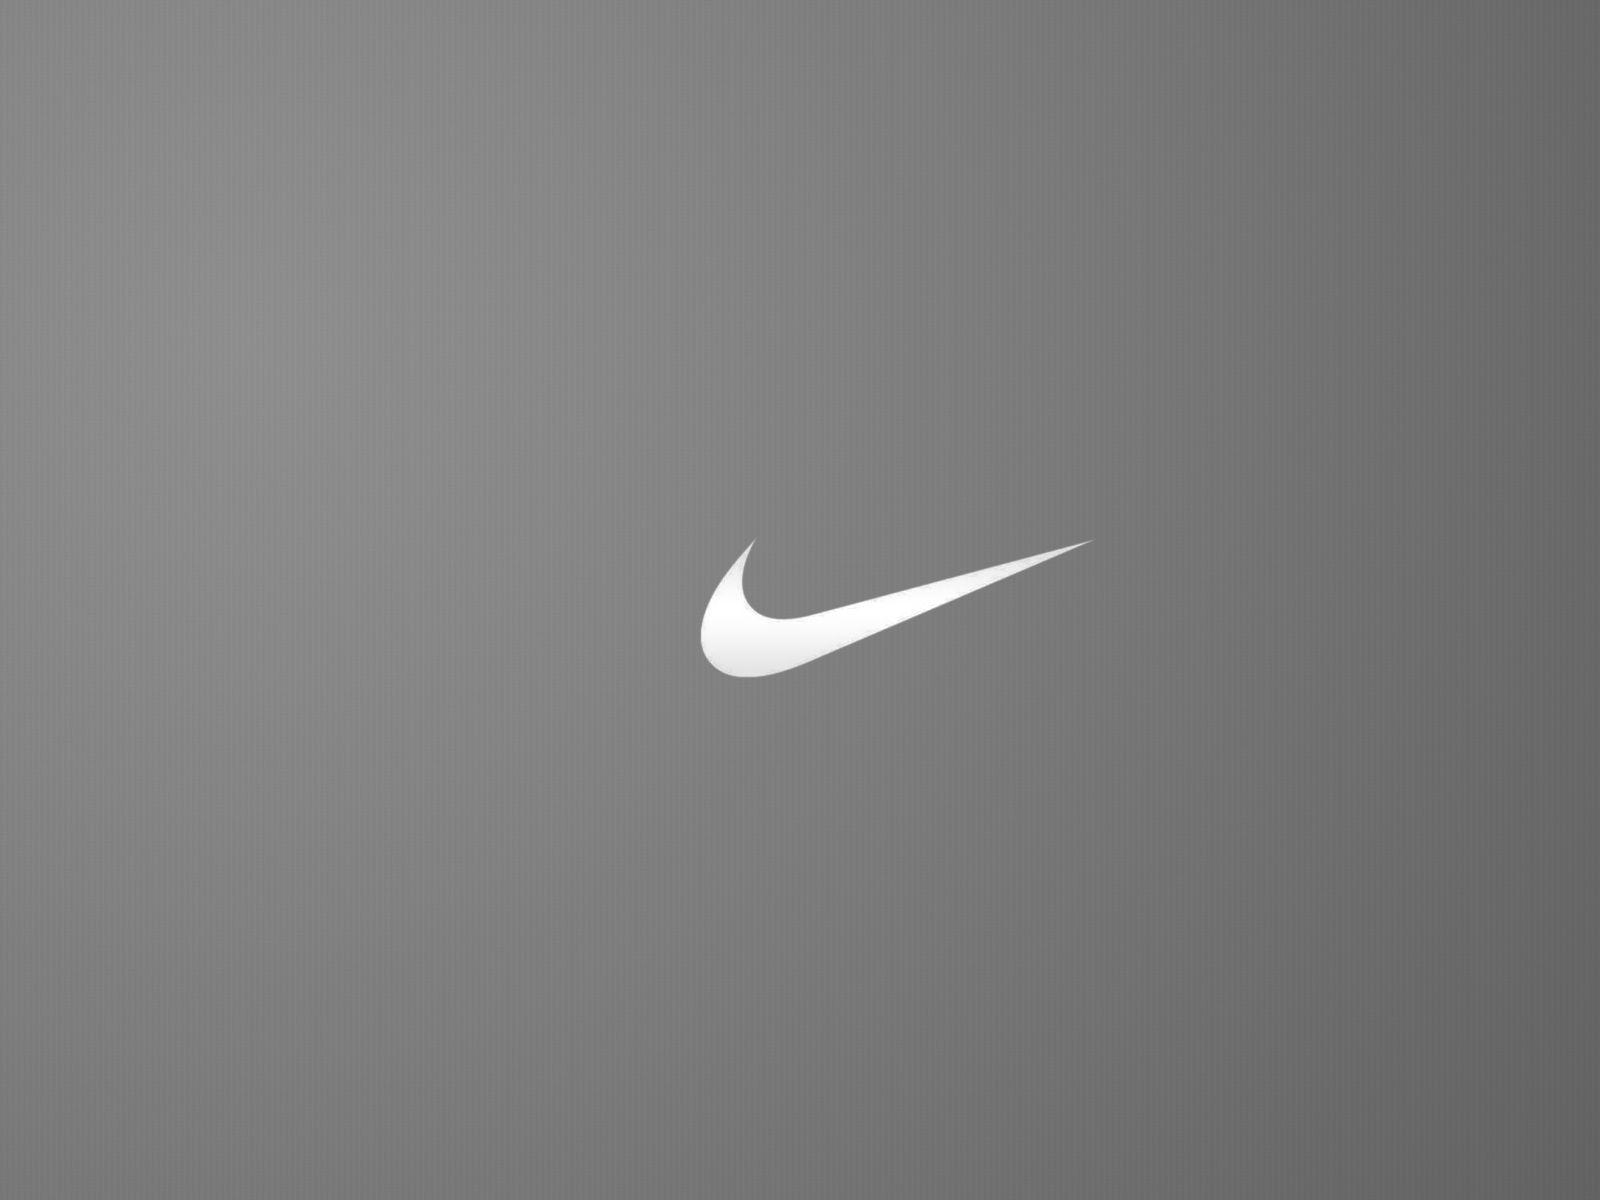 Nike Smoke Wallpapers